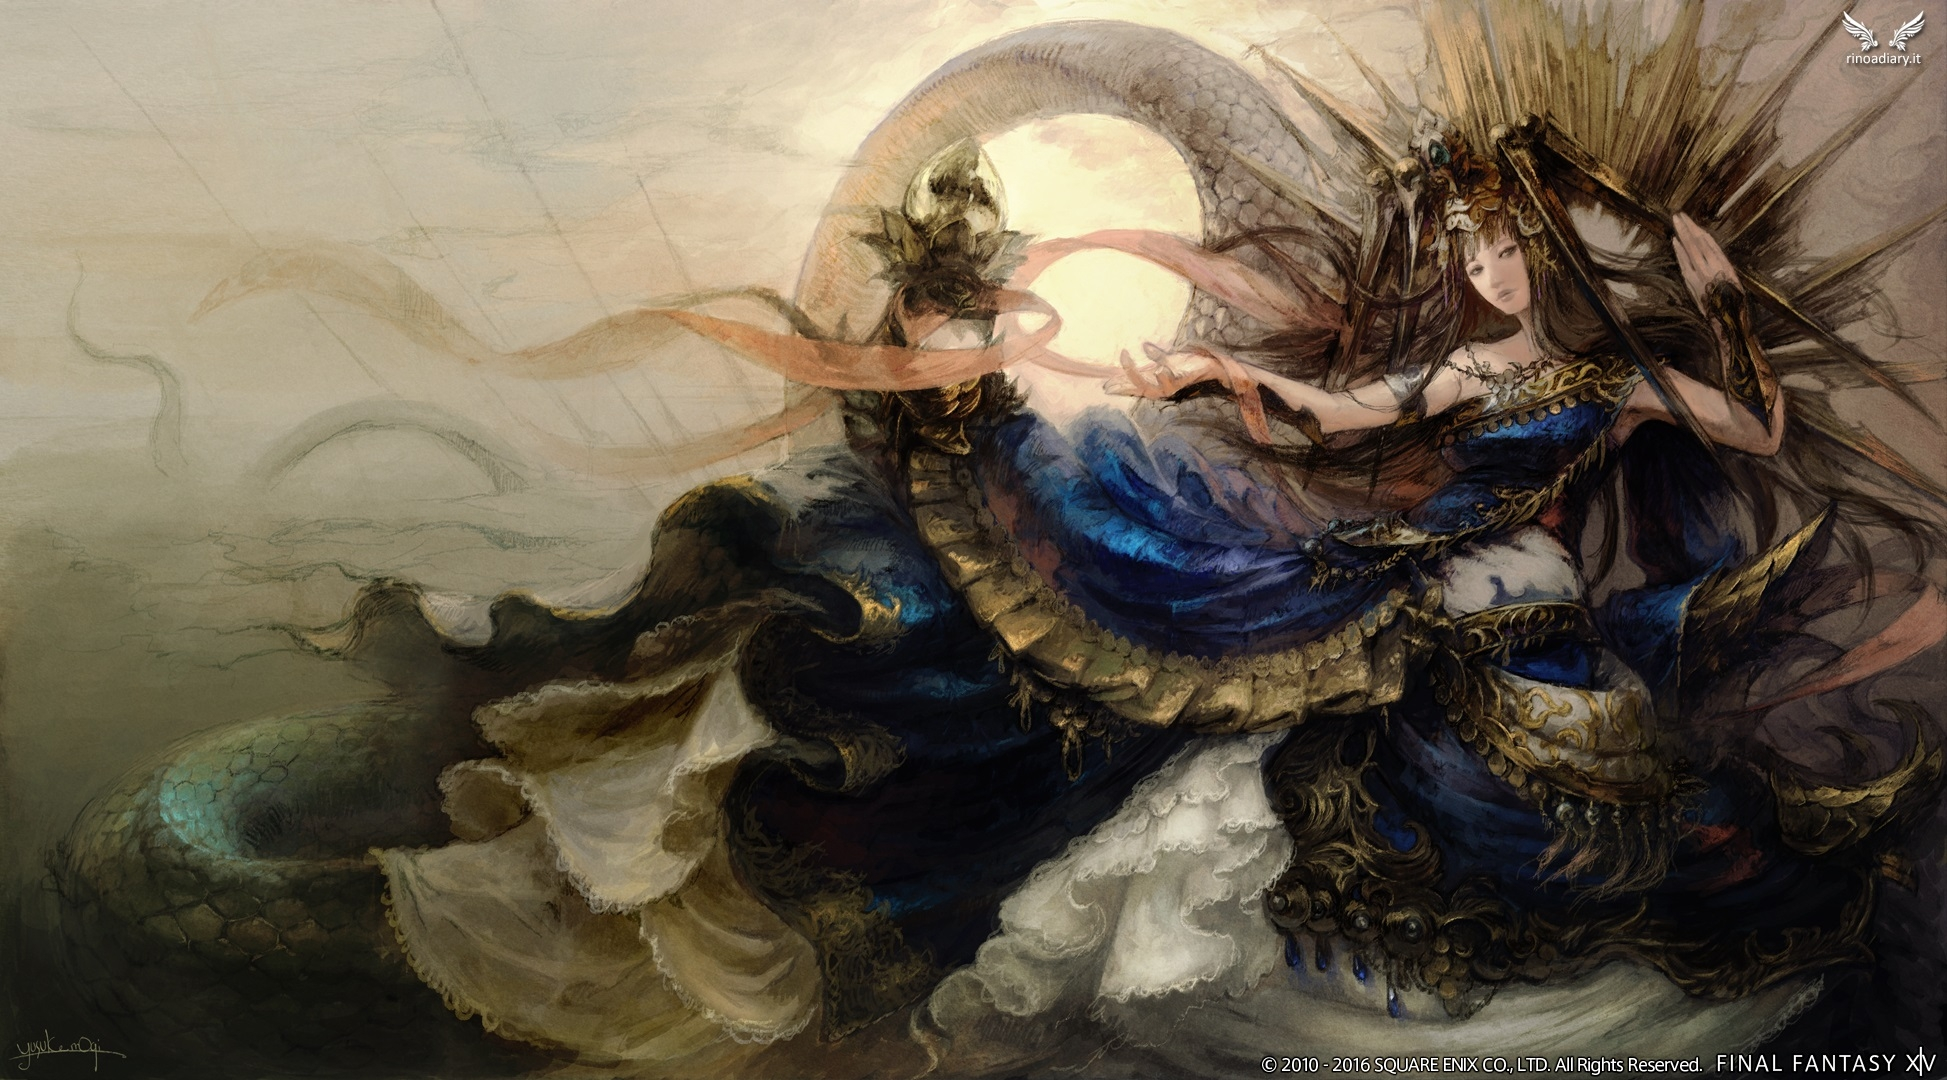 Artwork di Lakshmi - Lady of Bliss